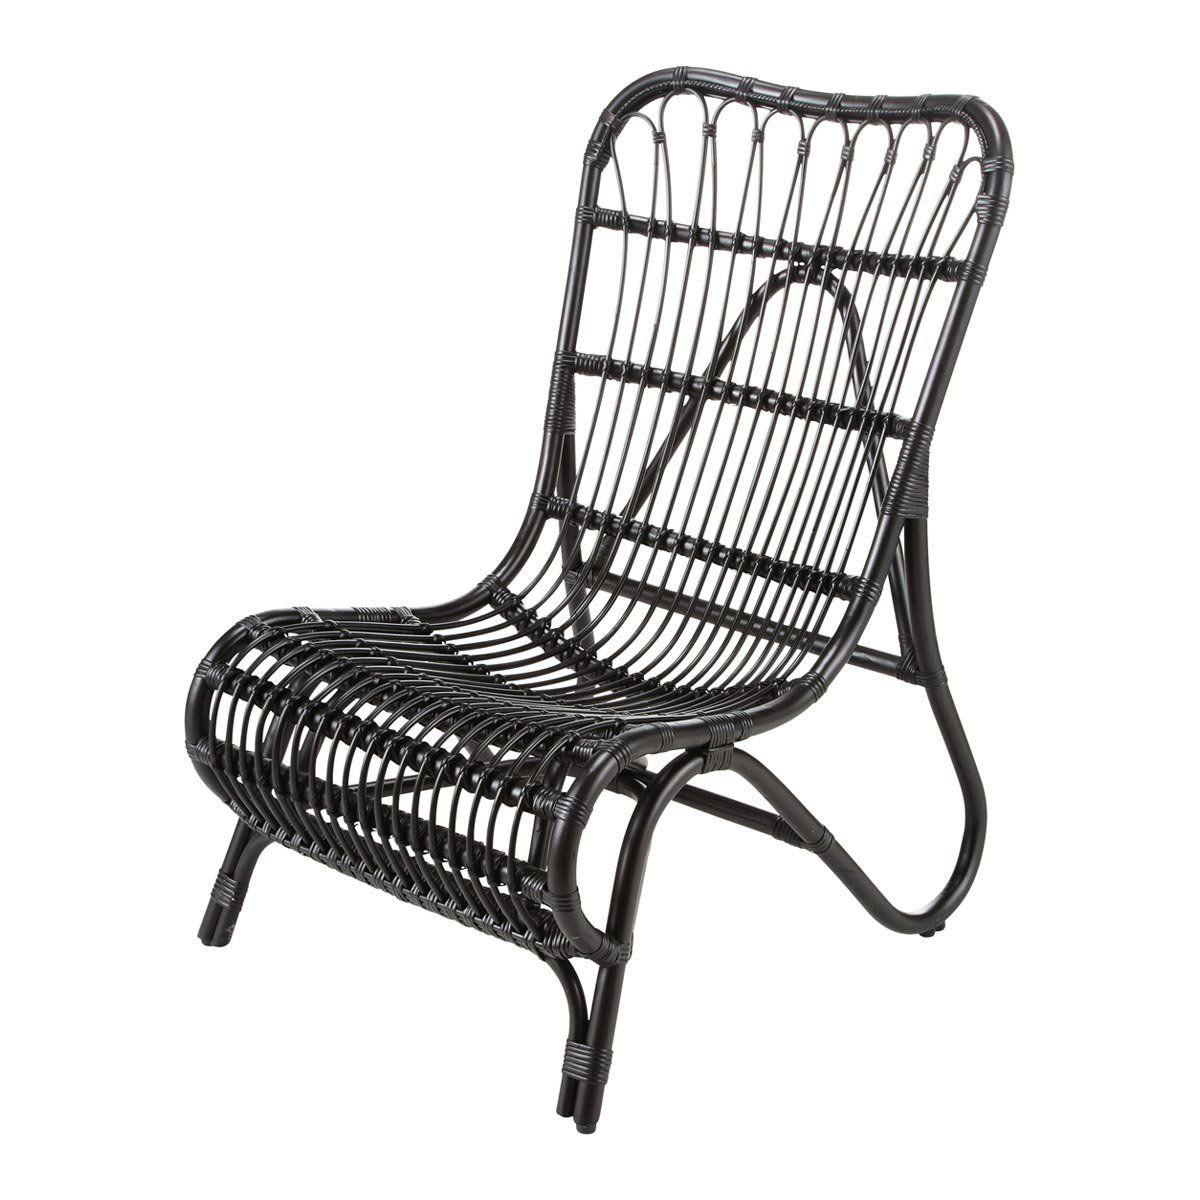 Maison Du Monde Fauteuil Rotin fauteuil rotin noir louisiane | home | outdoor chairs